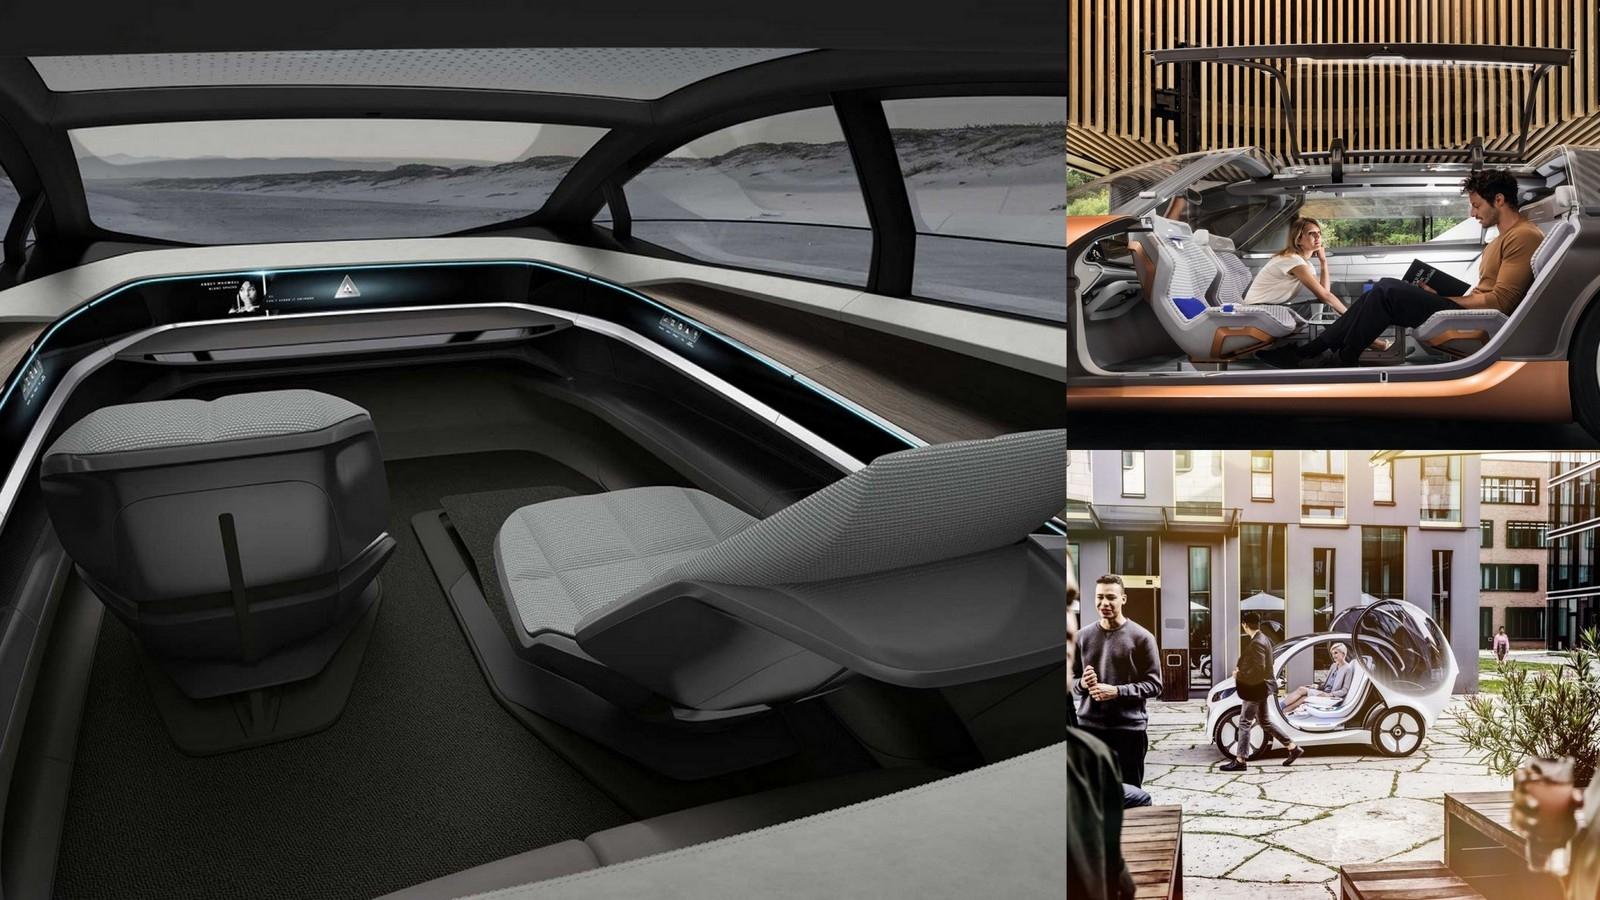 vid o salon de francfort les voitures autonomes sont l. Black Bedroom Furniture Sets. Home Design Ideas